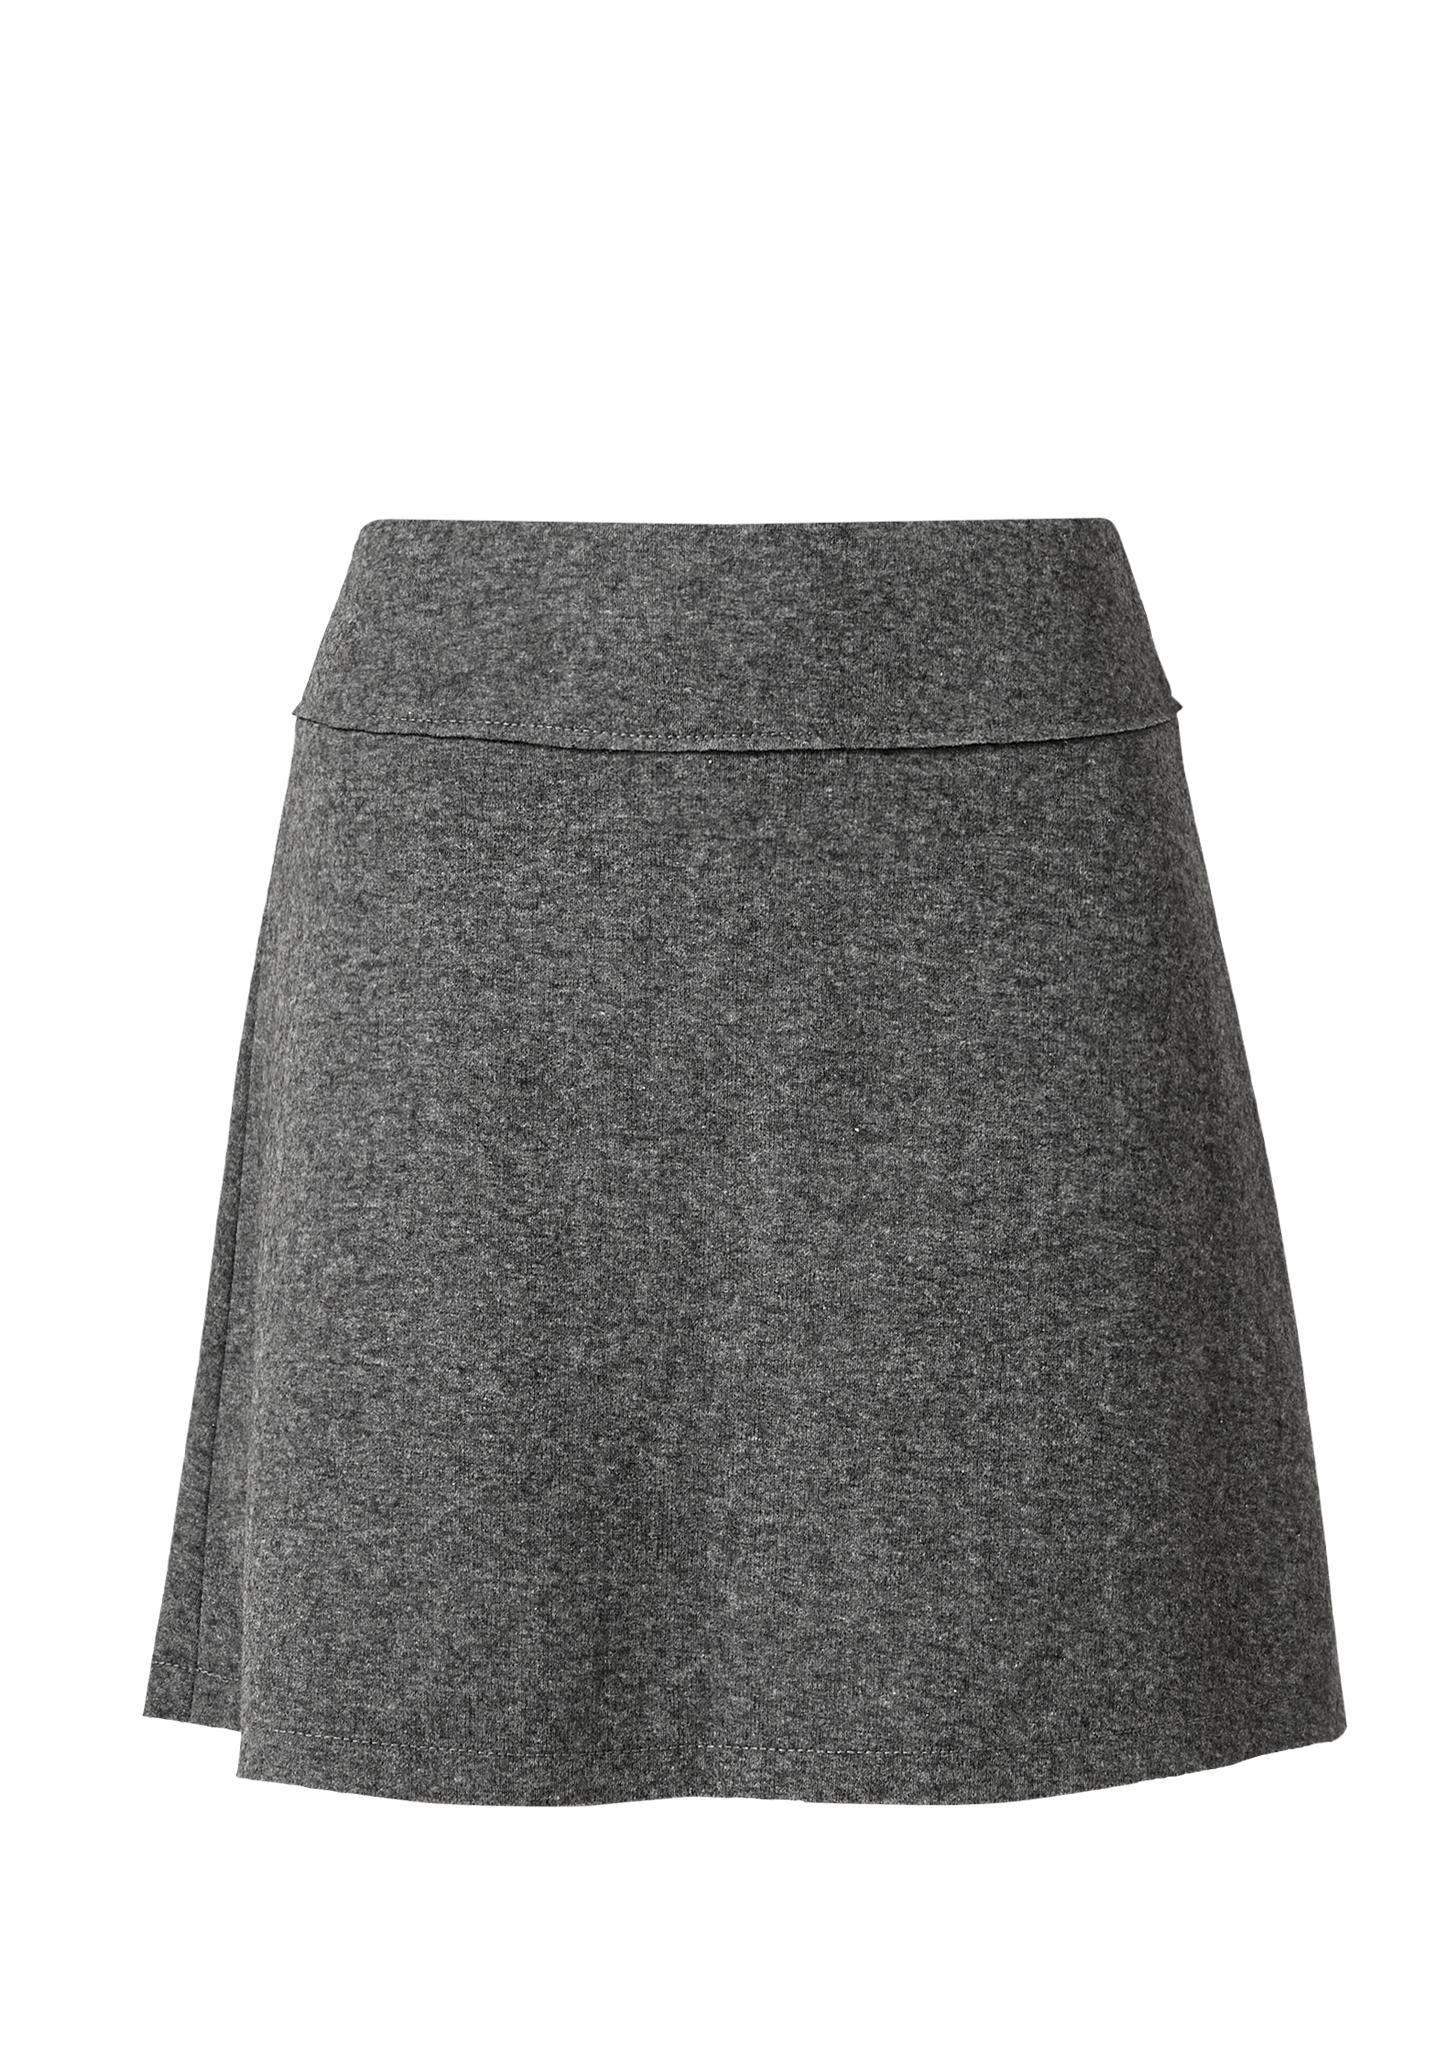 A-Linien-Rock   Bekleidung > Röcke > A-Linien Röcke   Grau/schwarz   Obermaterial 60% polyester -  35% wolle -  5% baumwolle  futter 100% polyester   s.Oliver